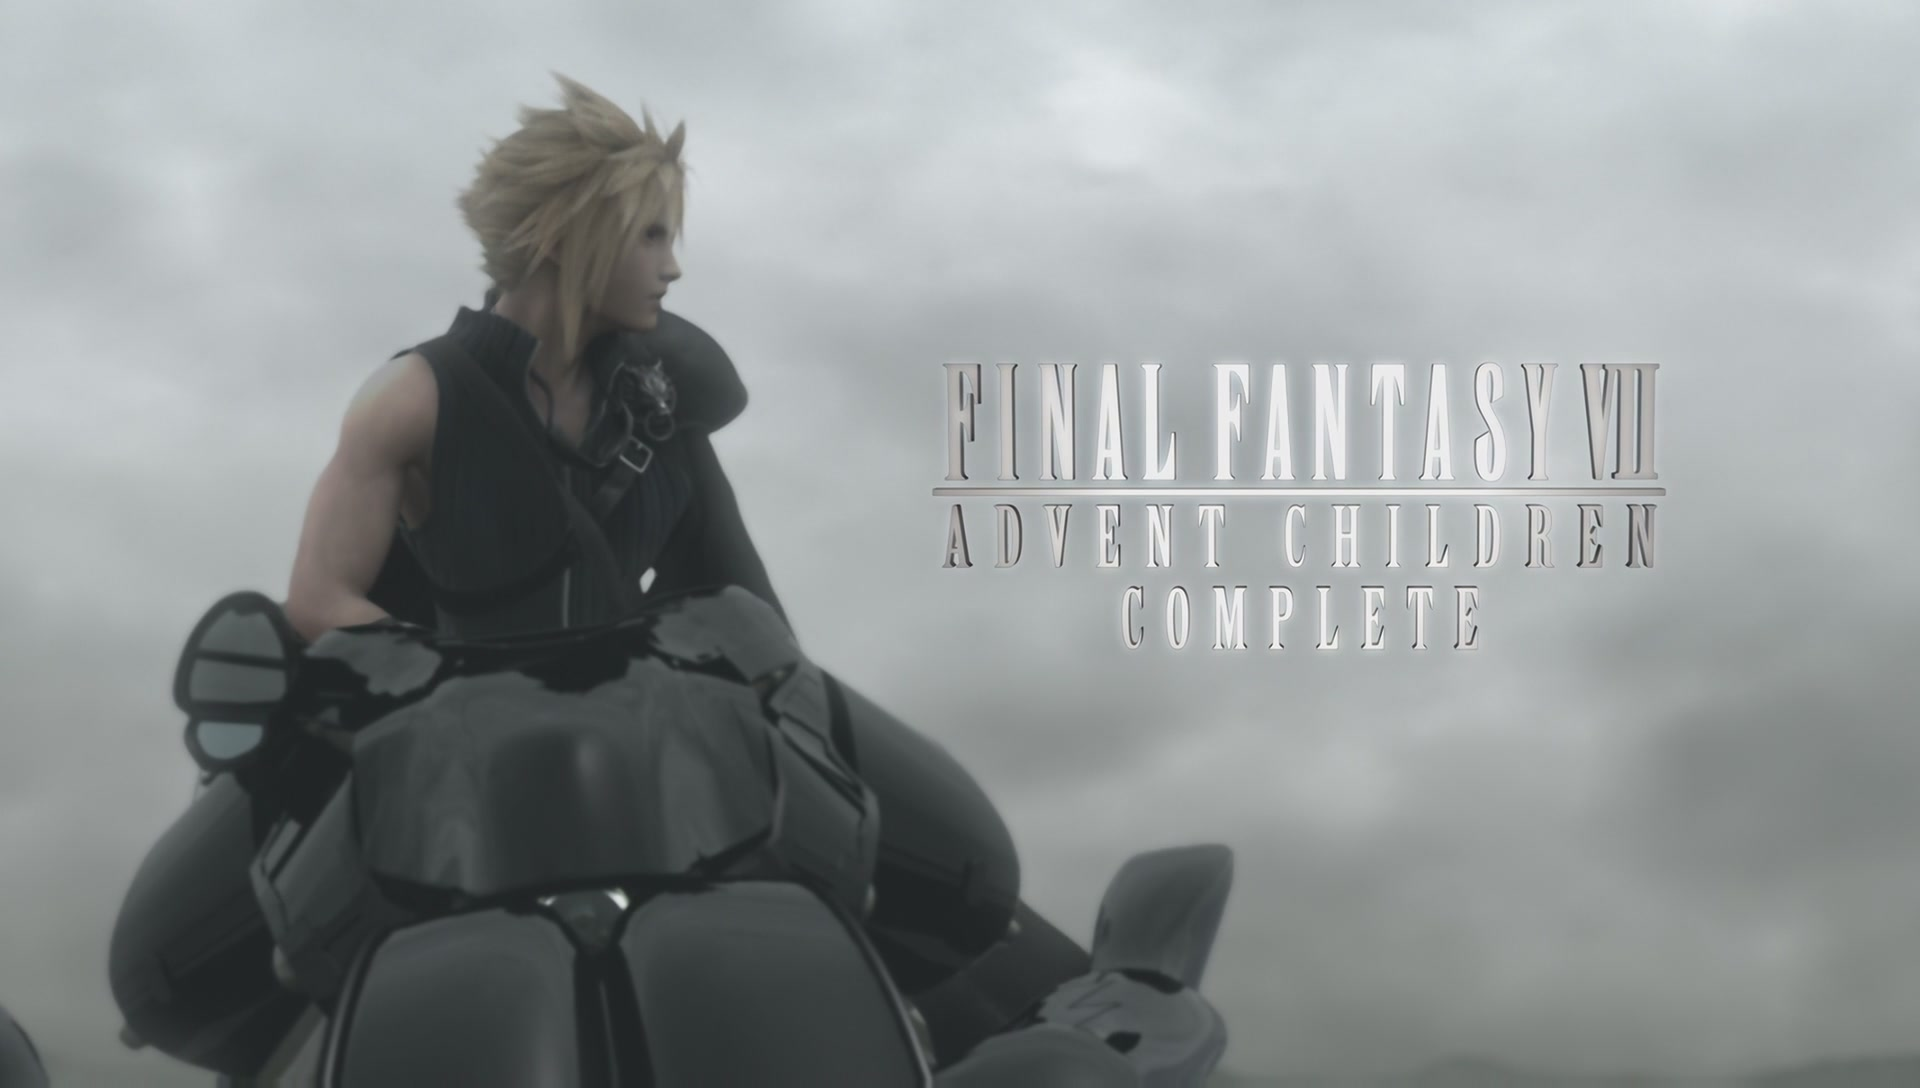 Final Fantasy Vii Advent Children Complete Hd Wallpaper